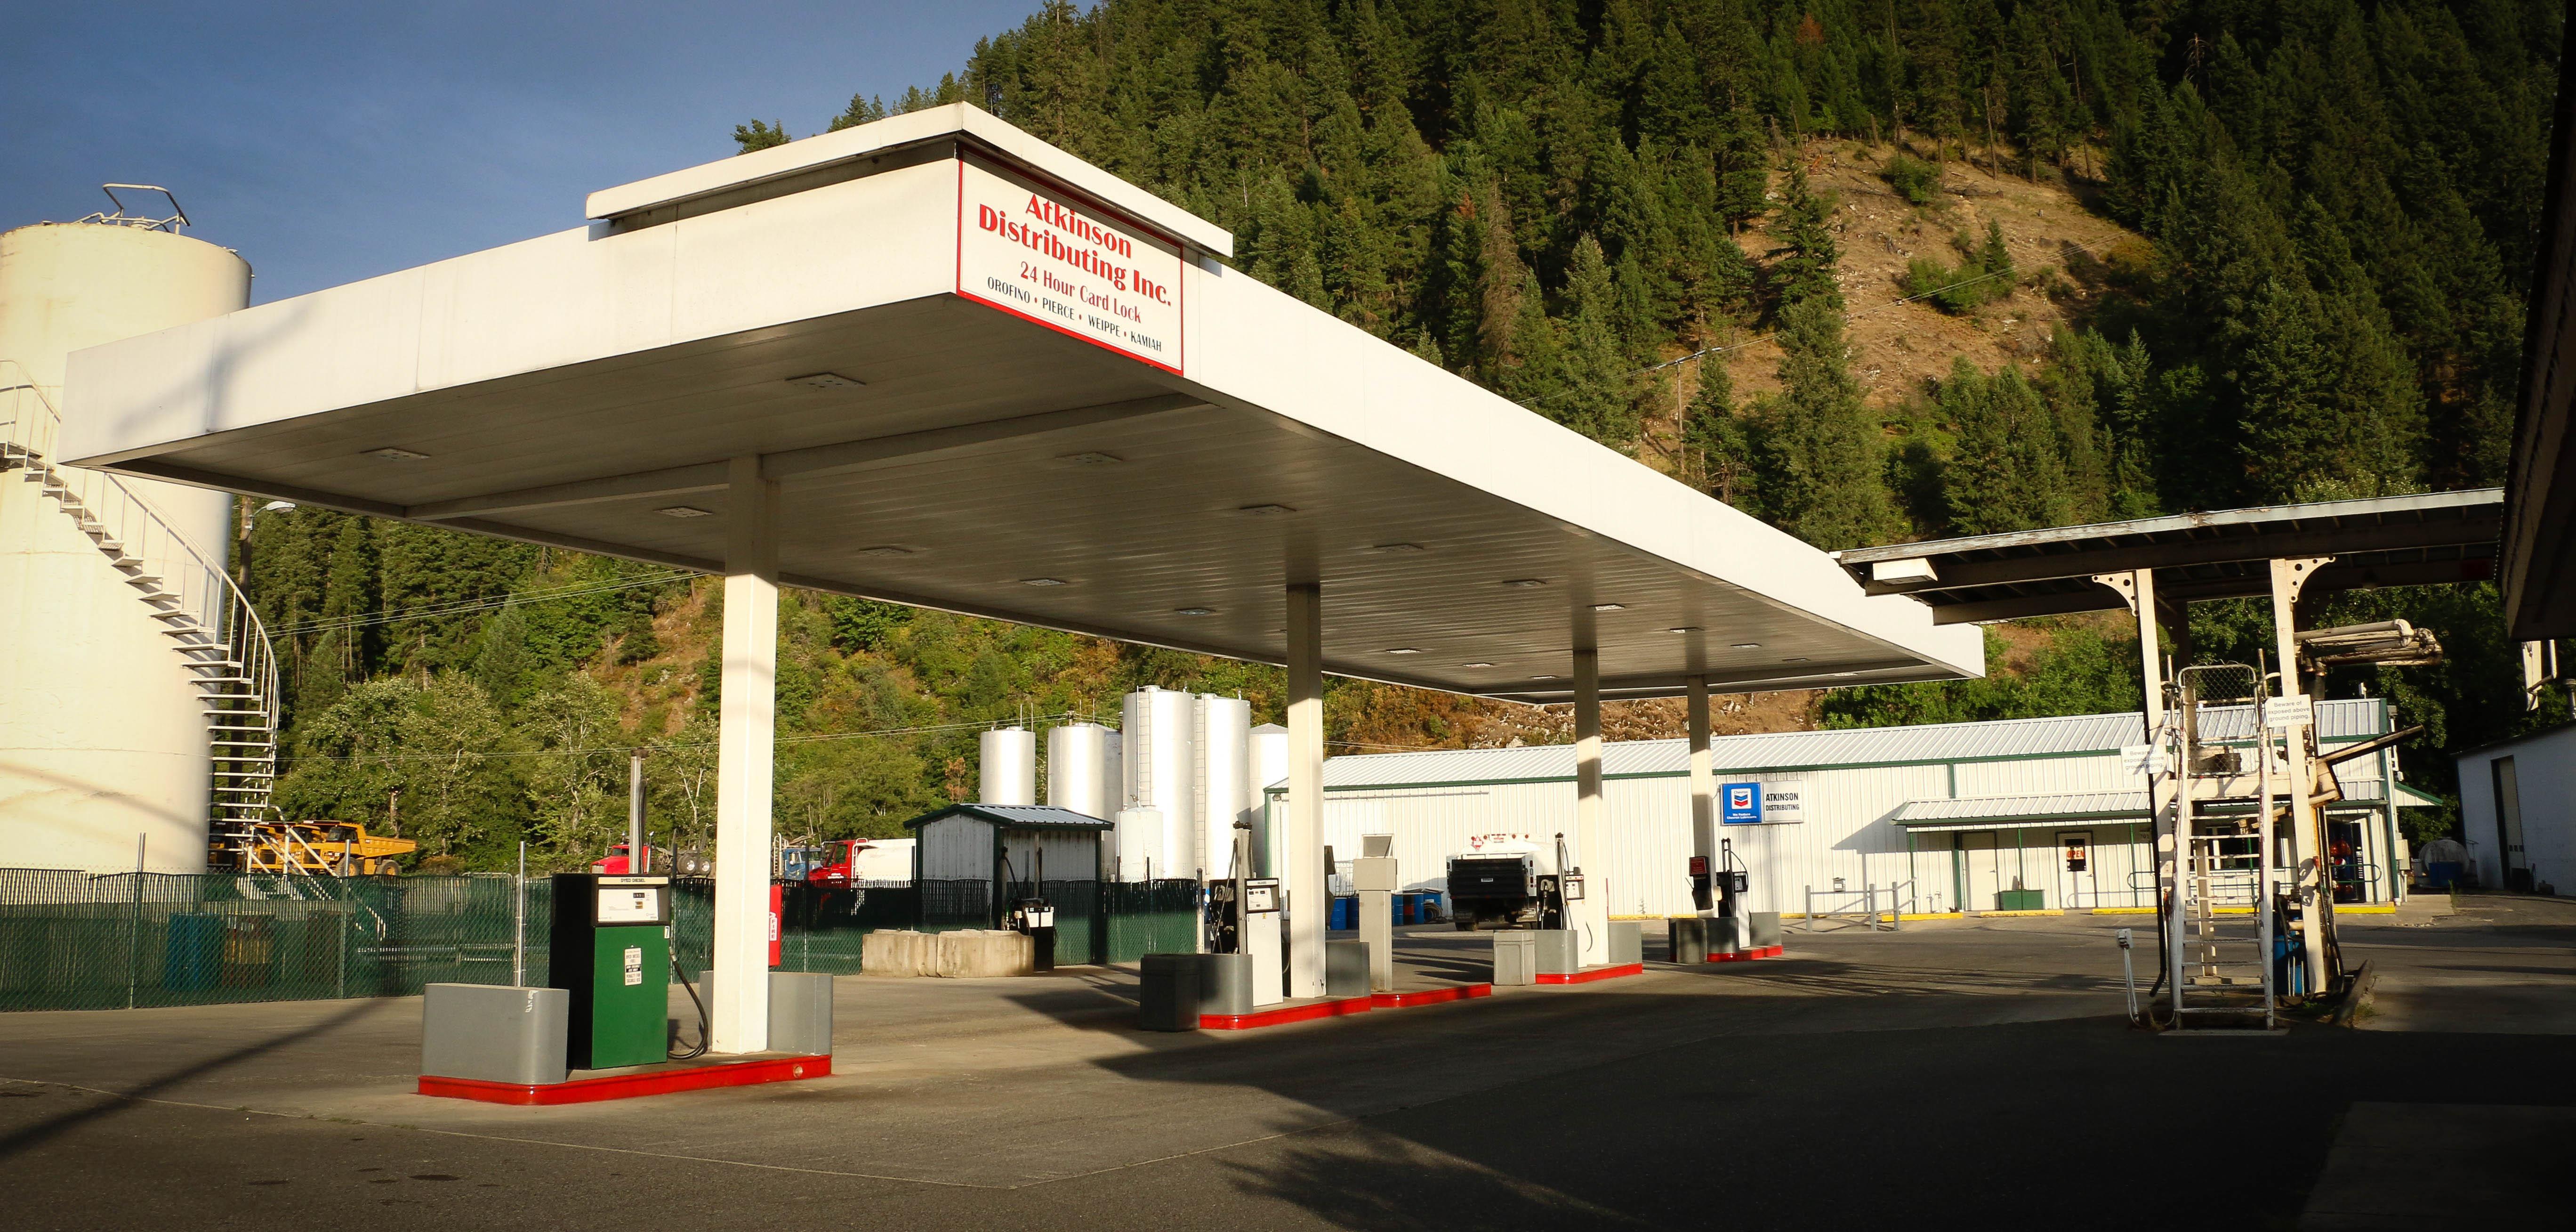 atkinson distributing oil fuel gas station services. Black Bedroom Furniture Sets. Home Design Ideas